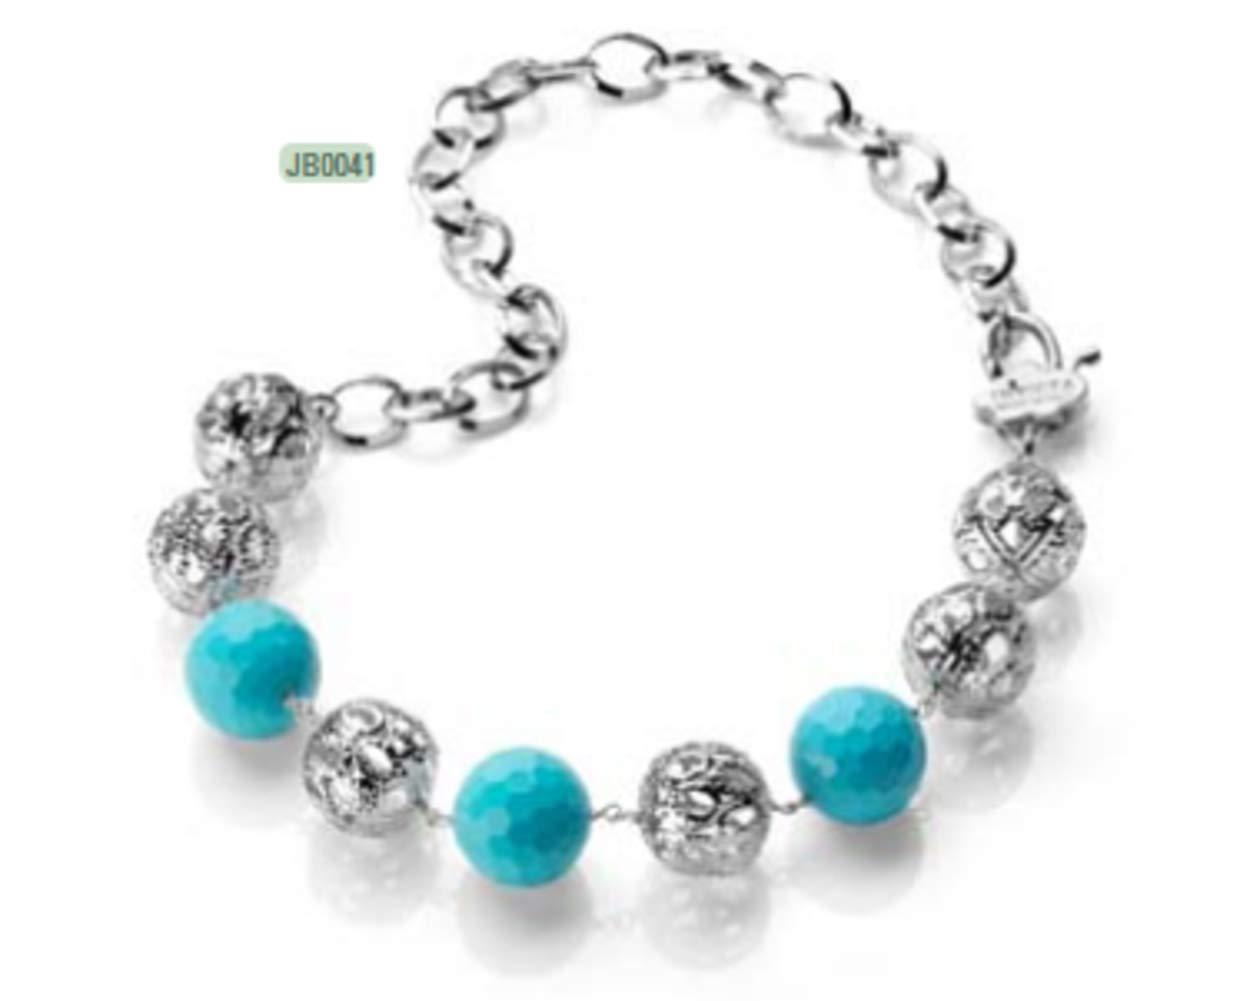 Invicta Necklace Selection (Iron. Turquoise. Rhodium Plating Necklace - JB0041)